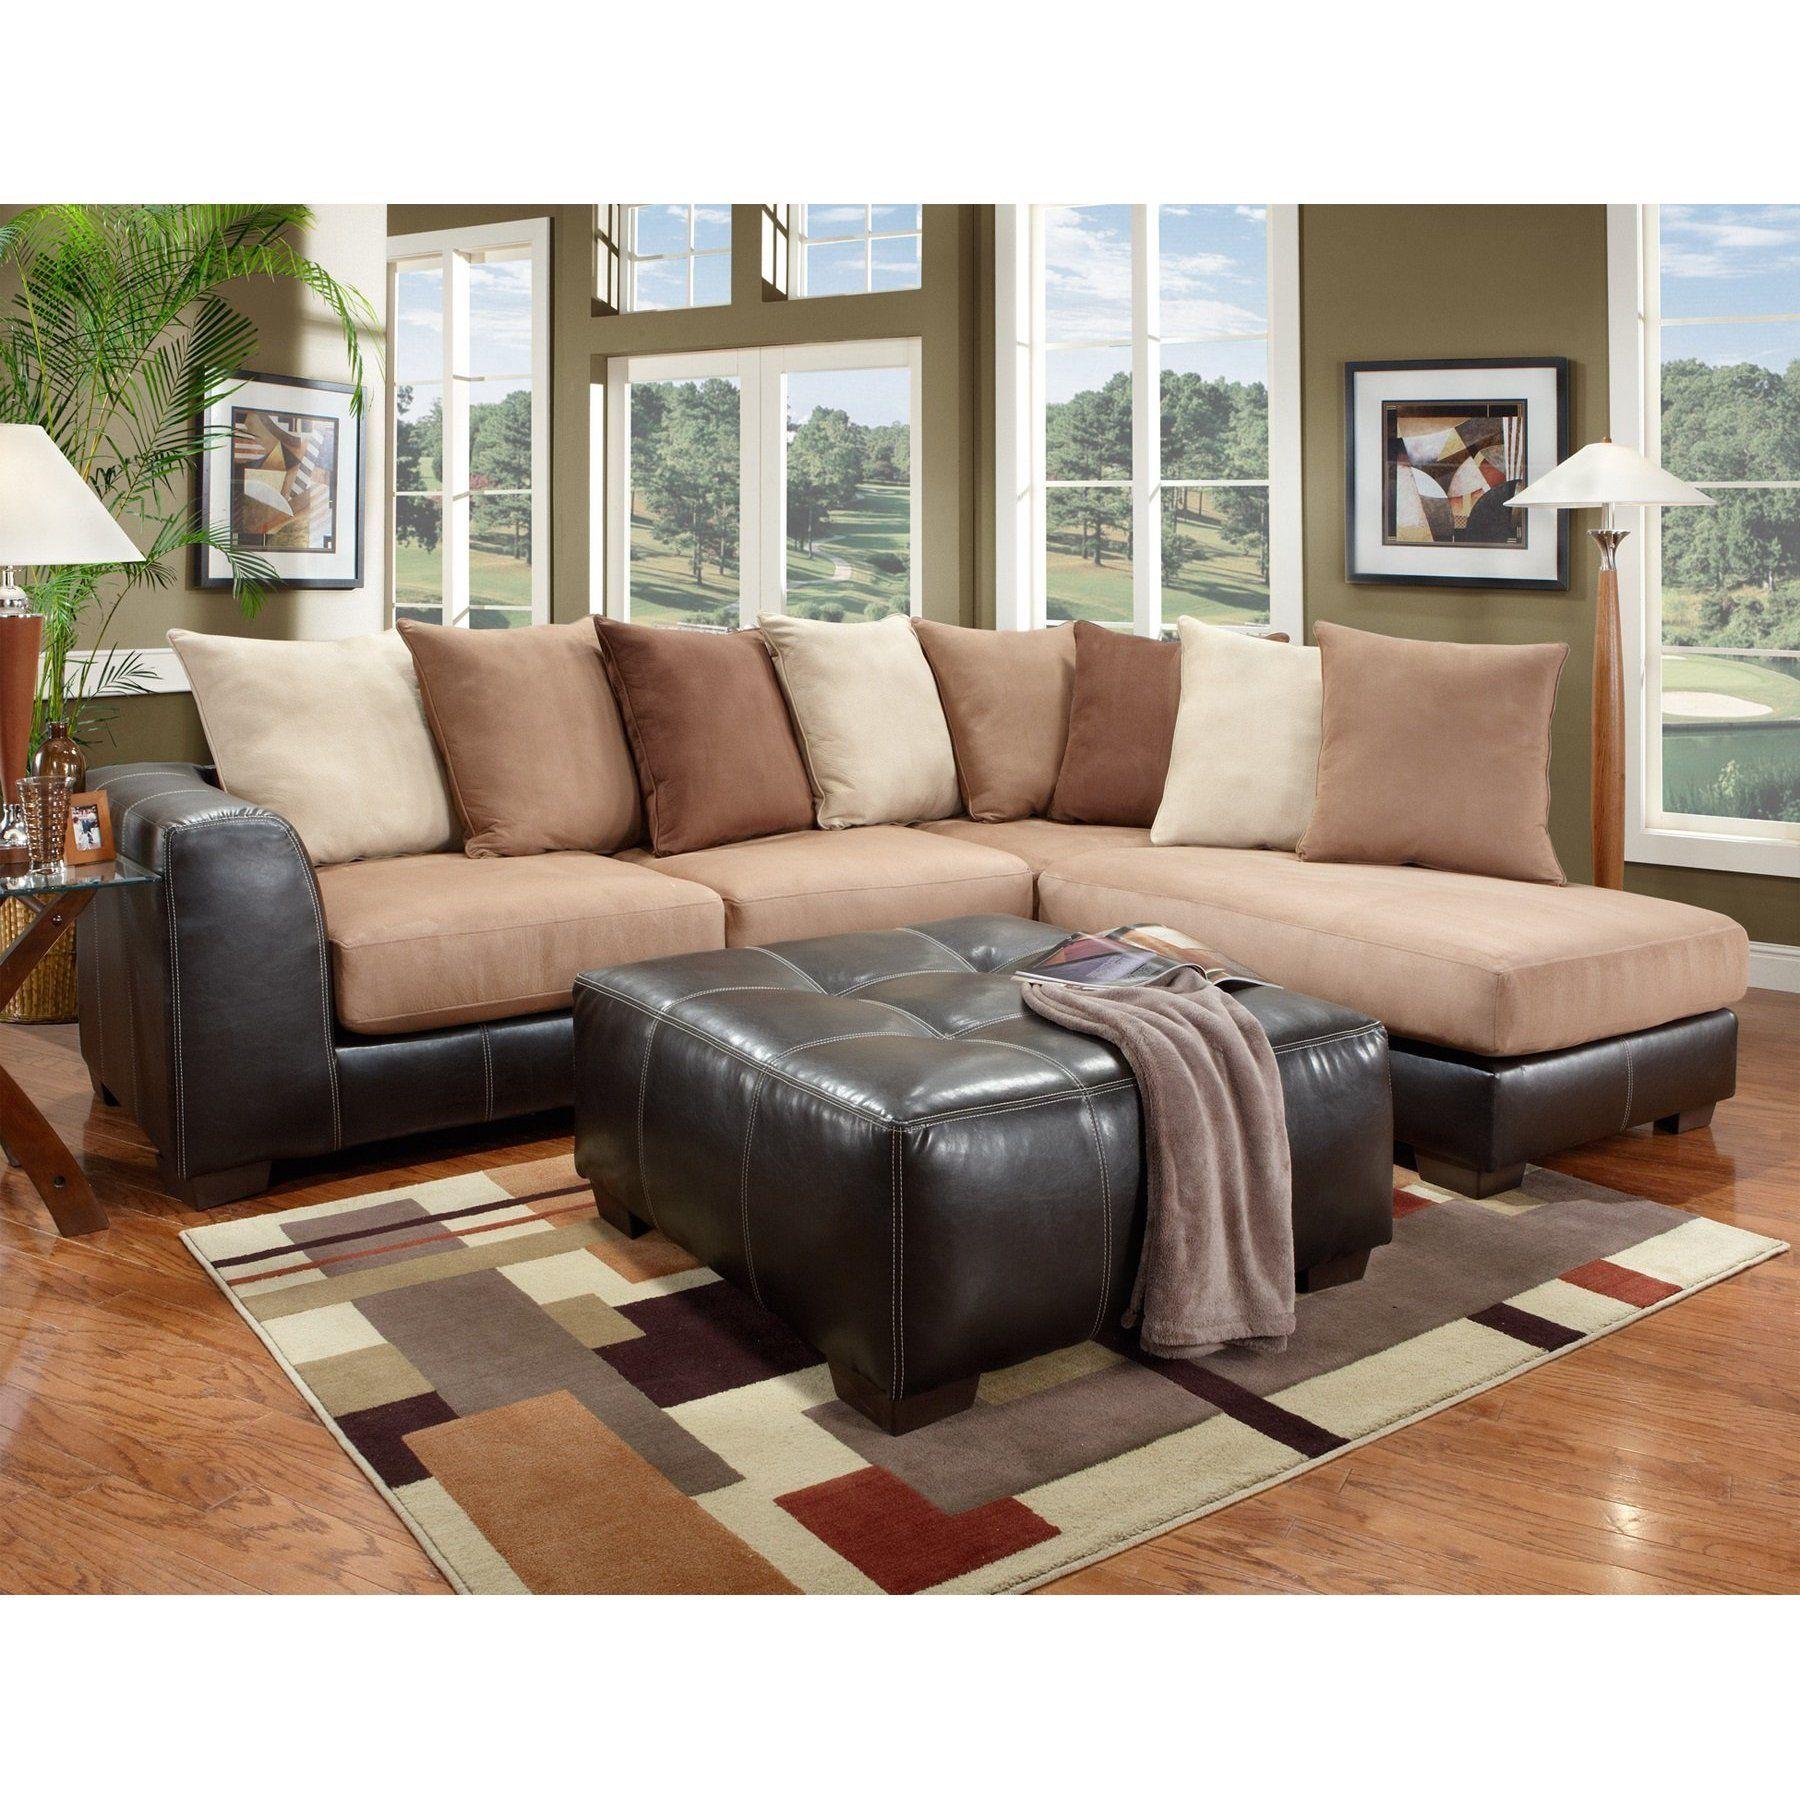 furnituremaxx laredo mocha sectional sofa with brown ottoman sofas rh pinterest com